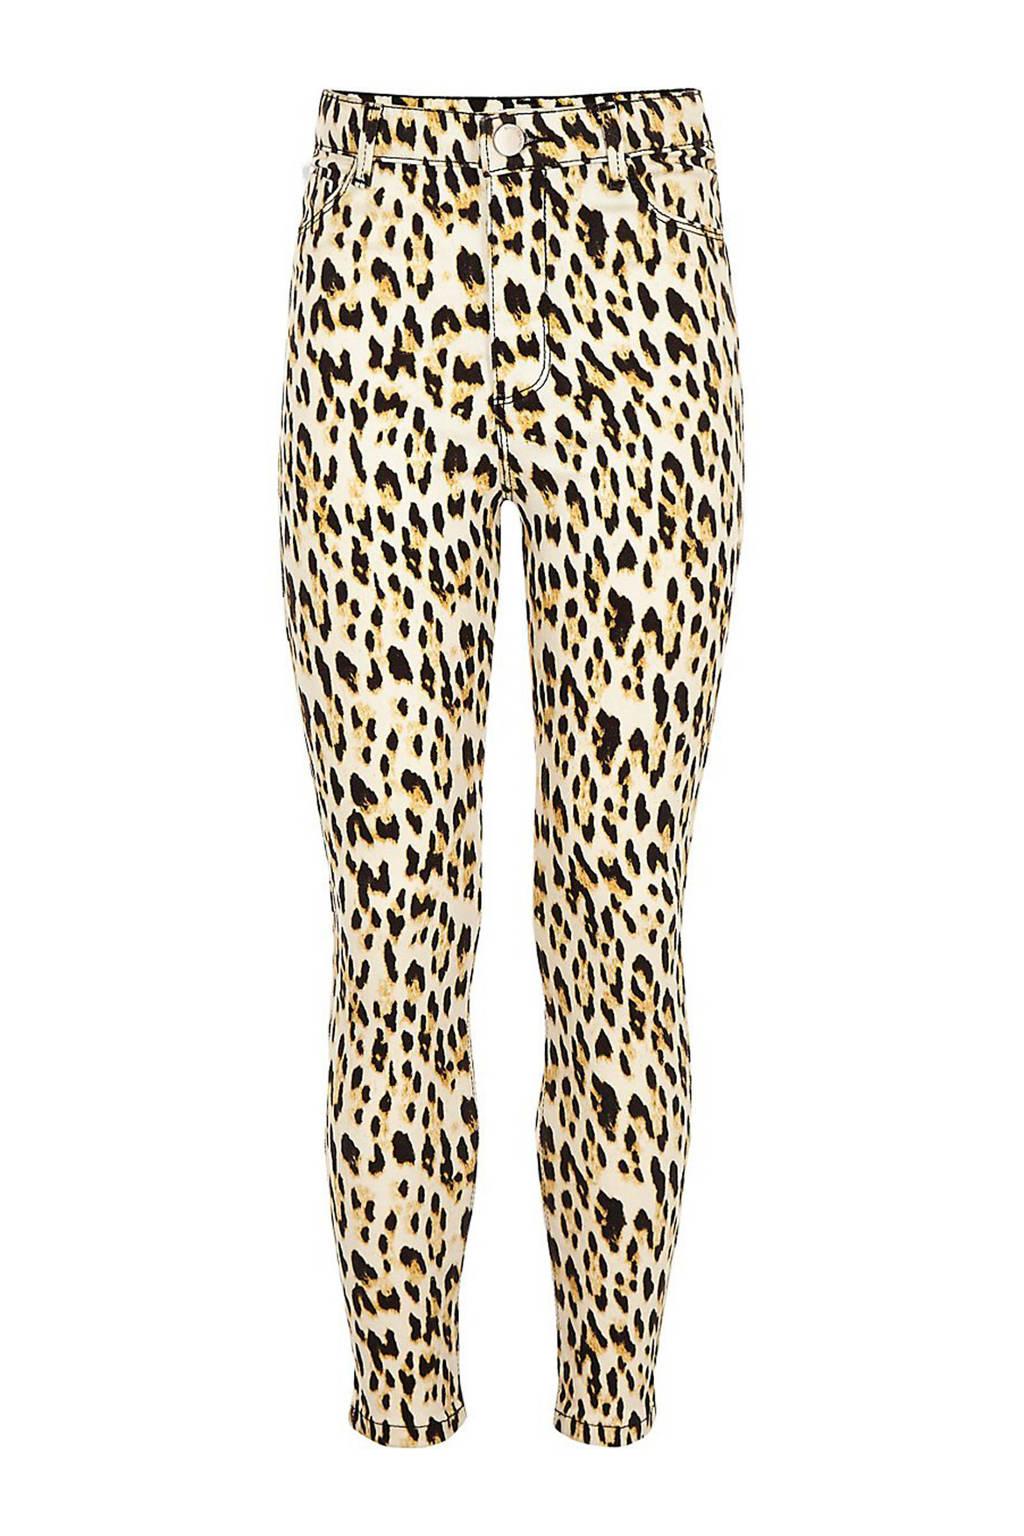 River Island high waist skinny jeans met panterprint beige, Lichtbeige